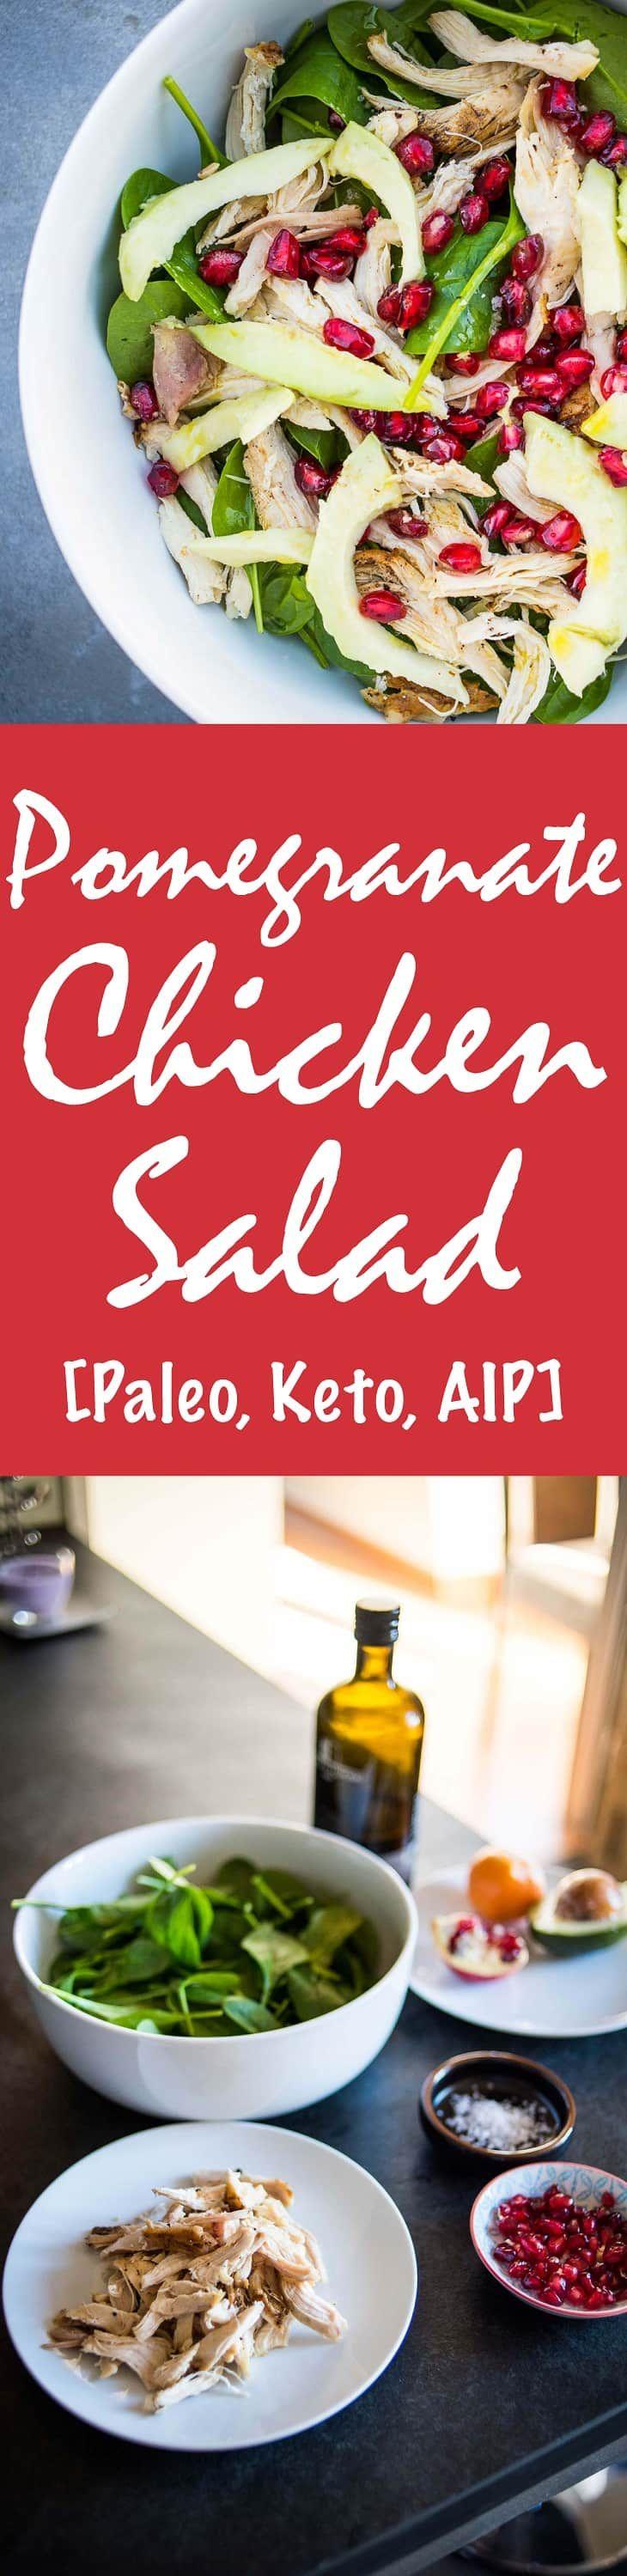 Pomegranate Chicken Salad Recipe [Paleo, Keto, AIP] #paleo #keto #aip - http://paleomagazine.com http://paleomagazine.com/pomegranate-chicken-salad-recipe